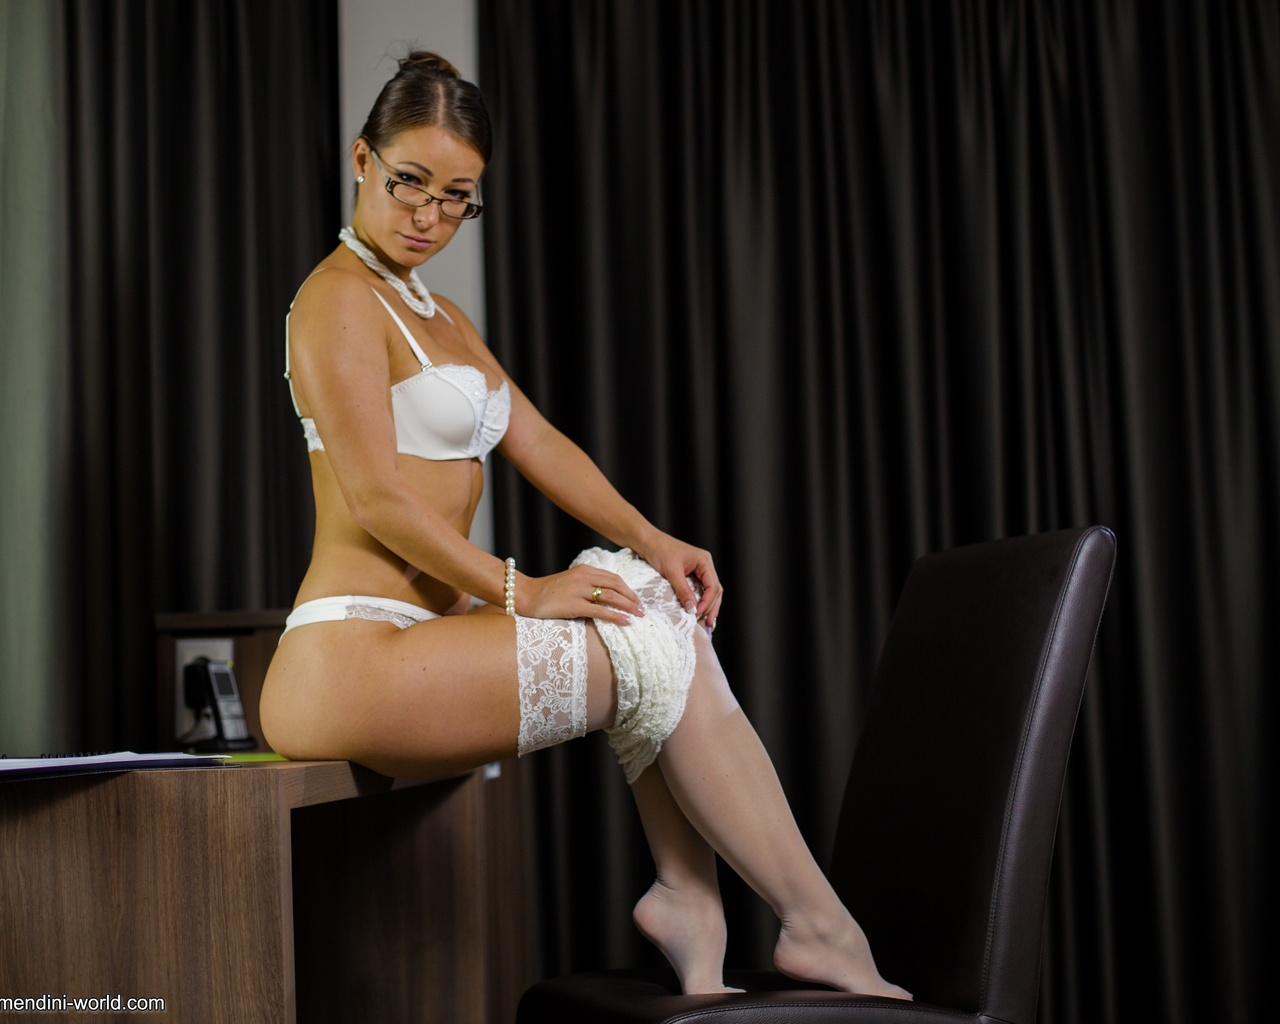 melisa mendiny, стол, шторы, белое белье